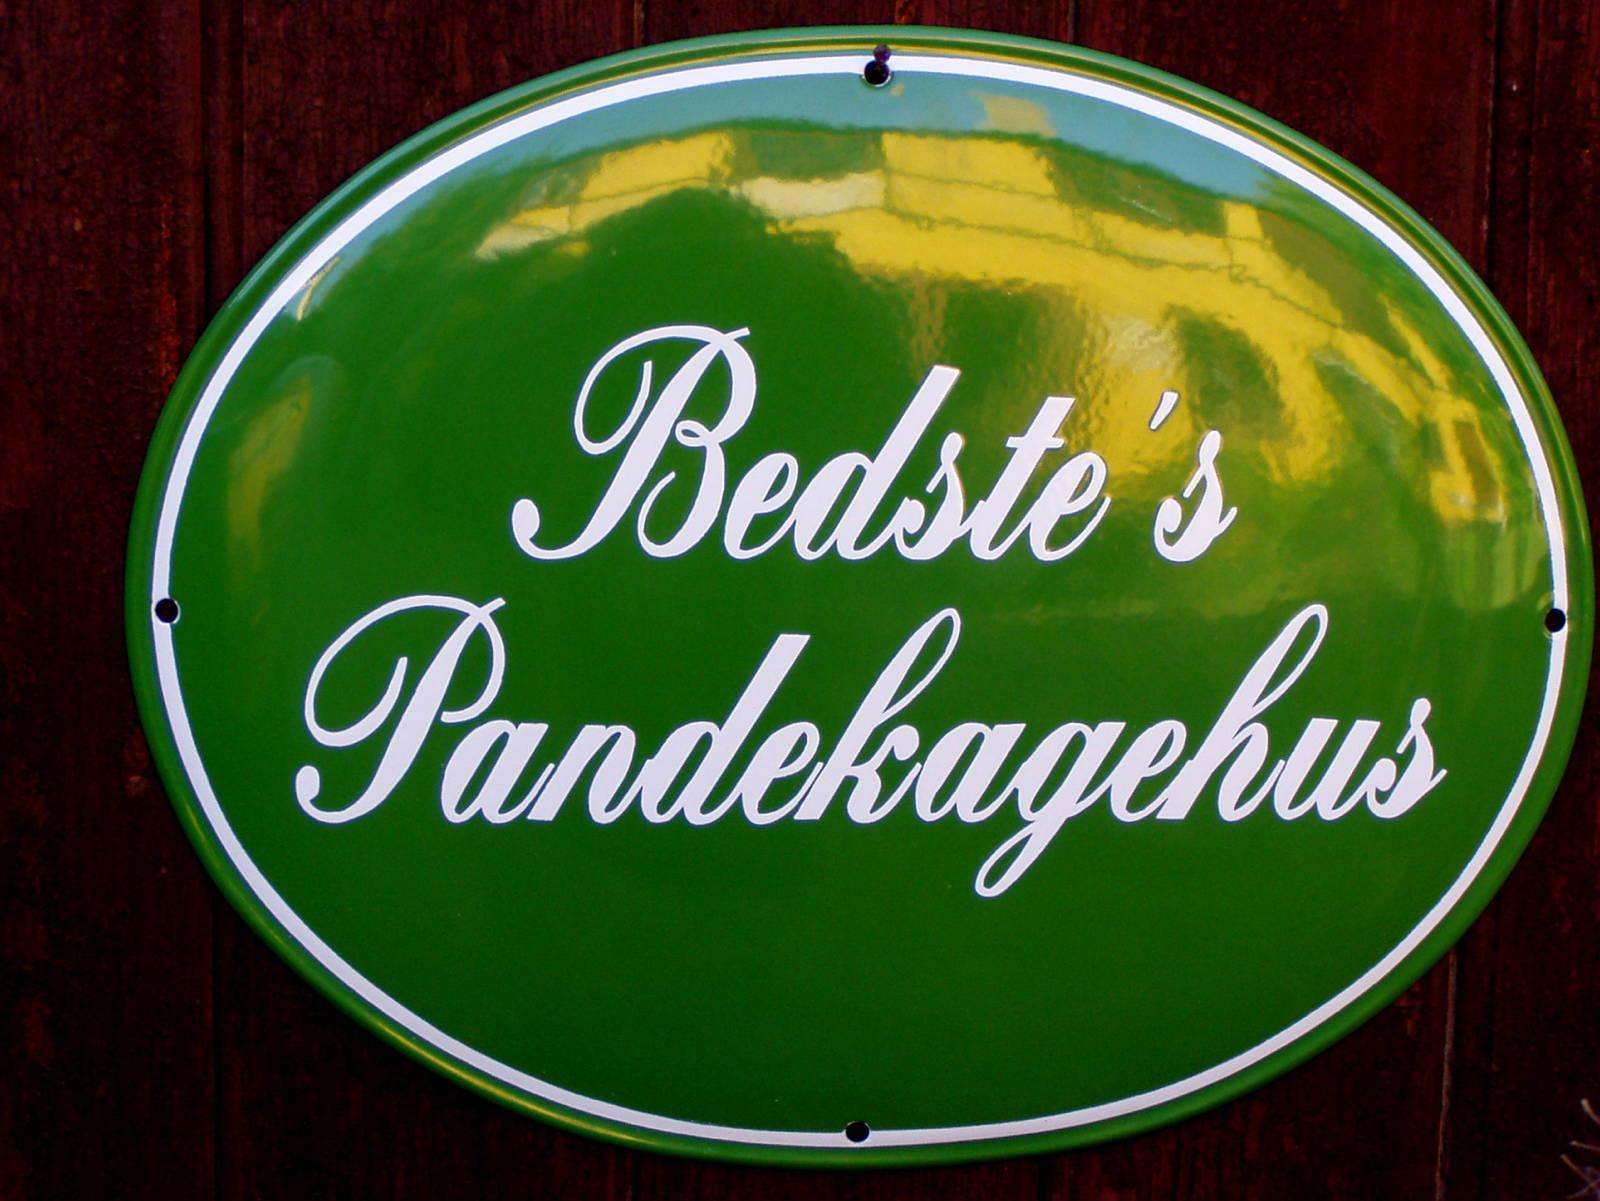 Husskilte-Pandekagehus-web1600